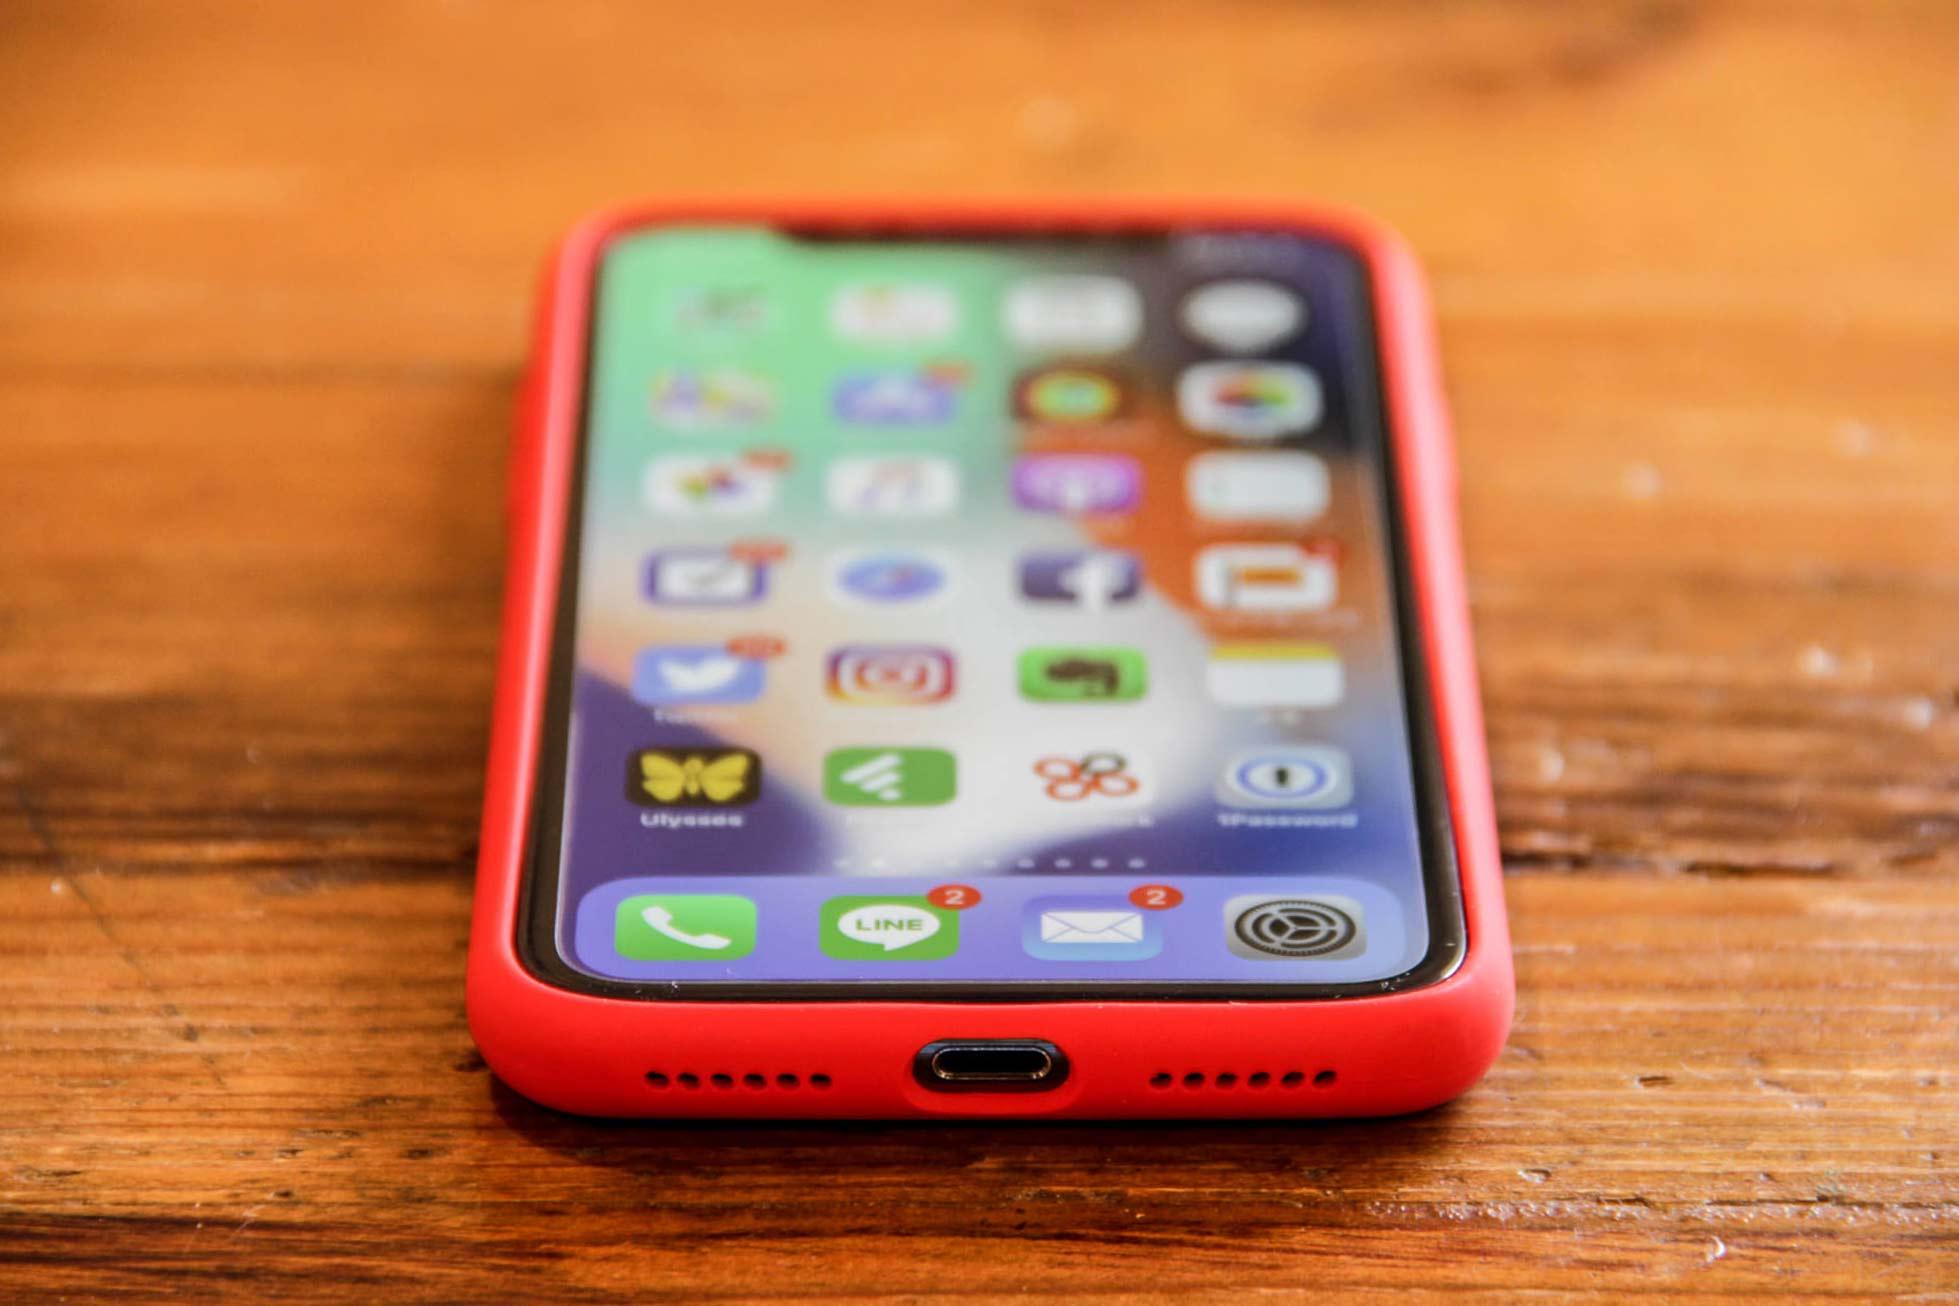 iPhone X Jasbon シリコンケース外観 前面下部の写真